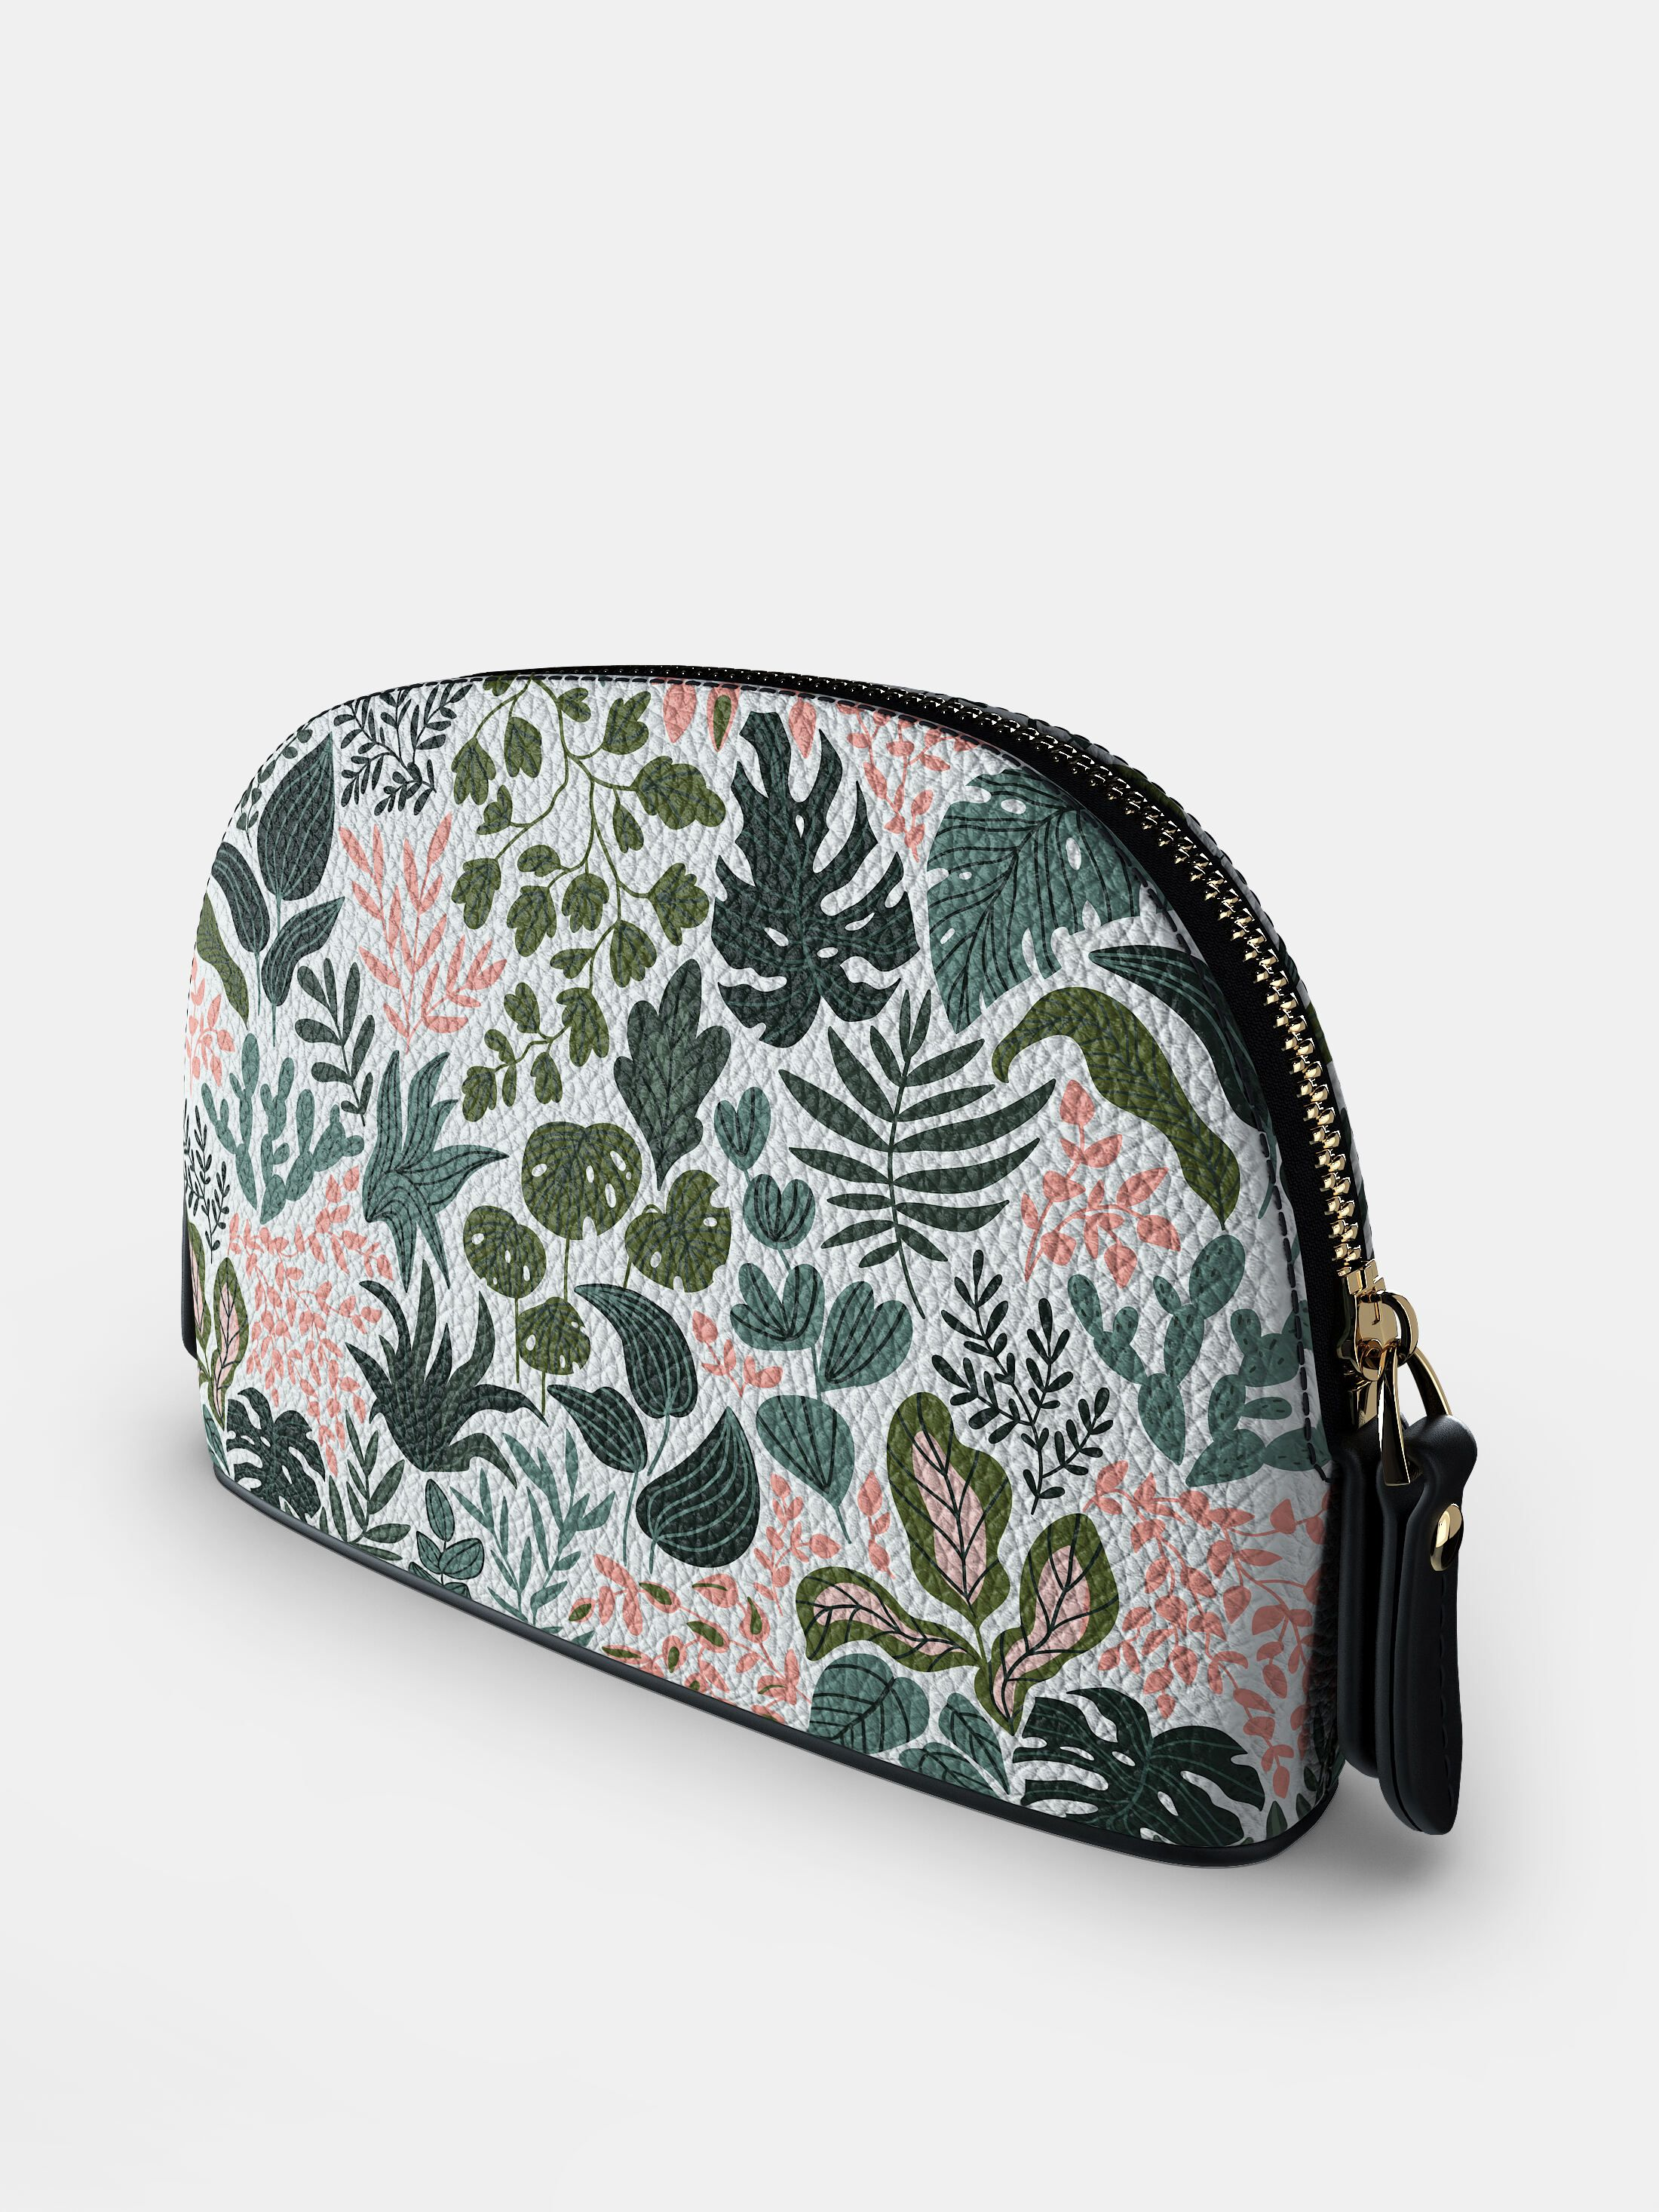 leather custom cosmetic case